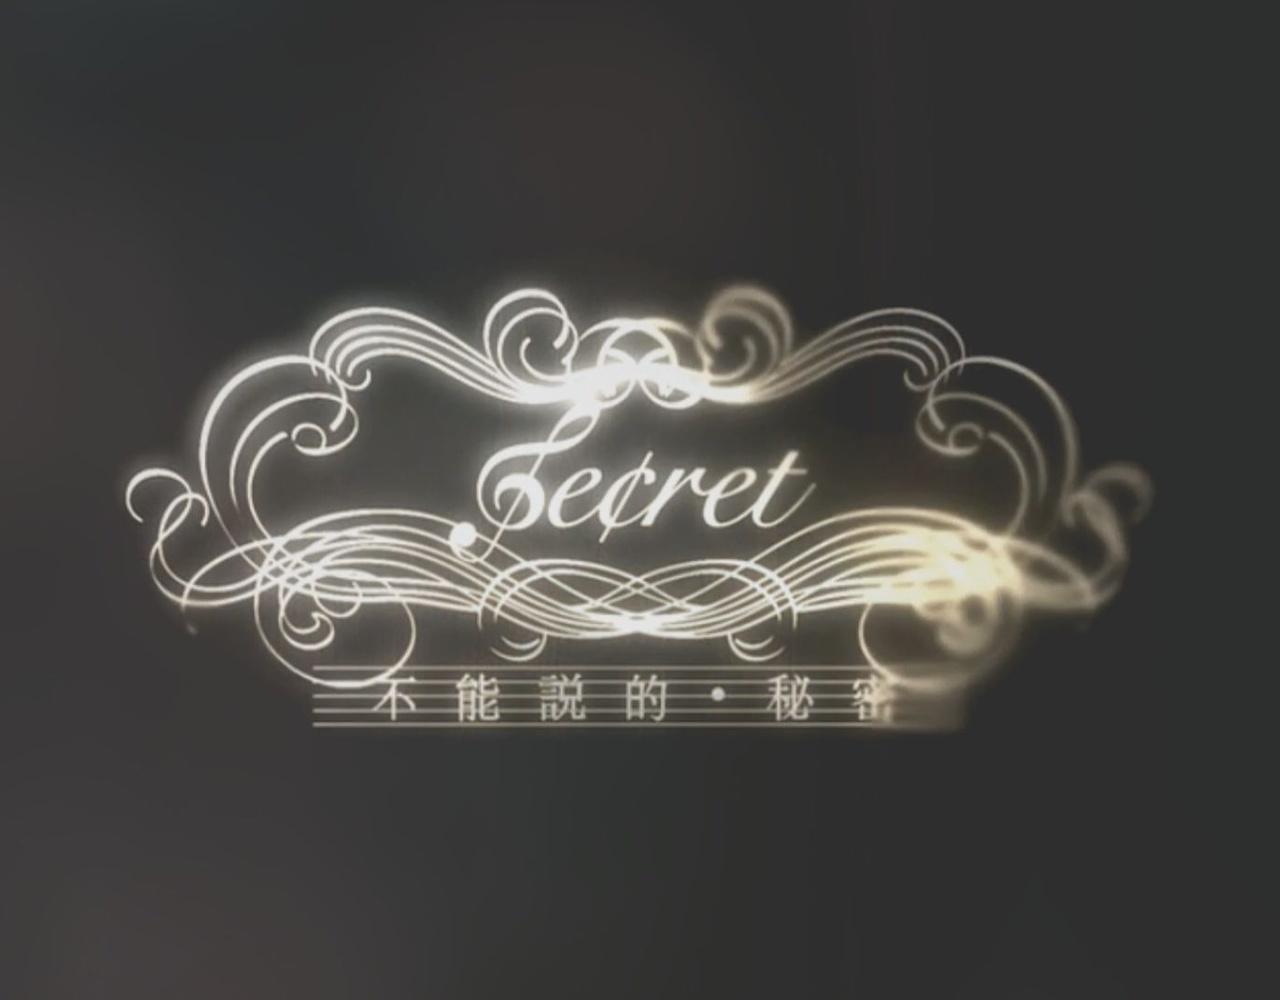 【凯源】Secret